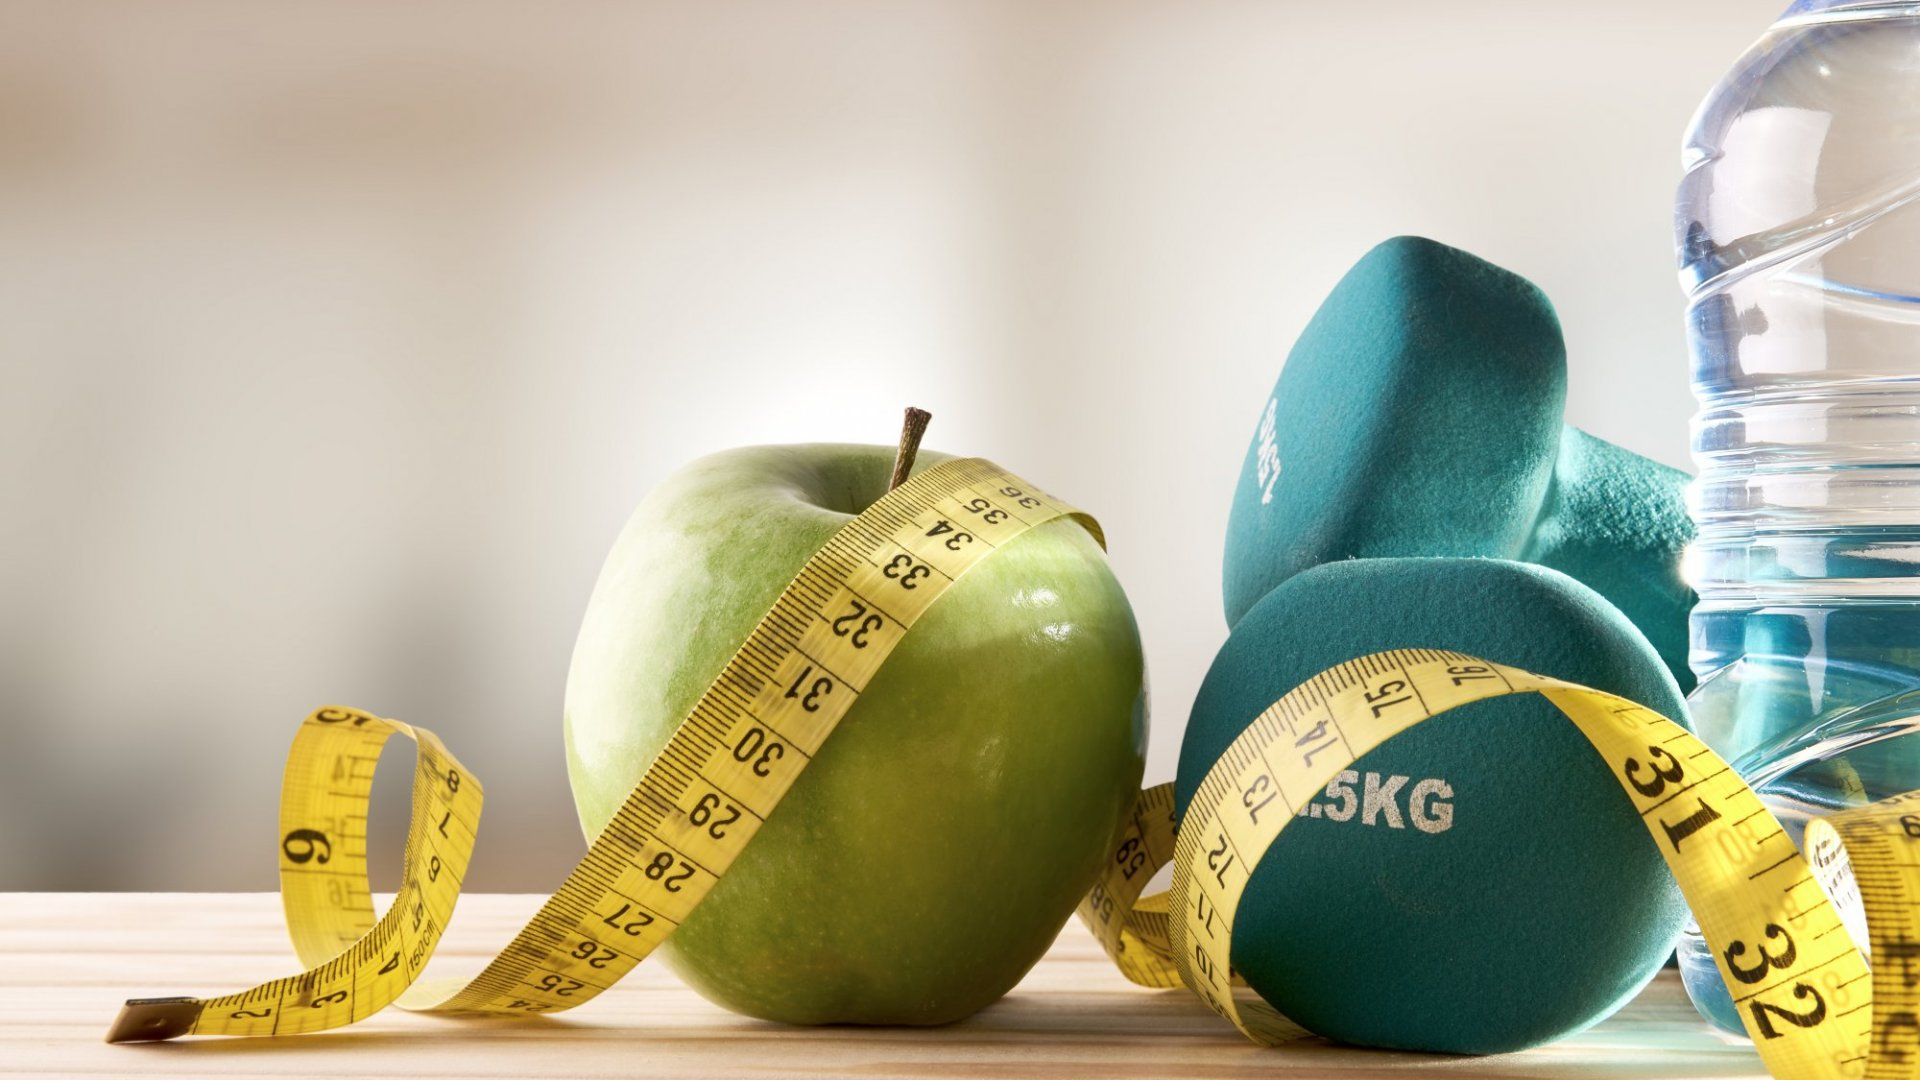 Randomized-Controlled Study: Wellness Programs Don't Work